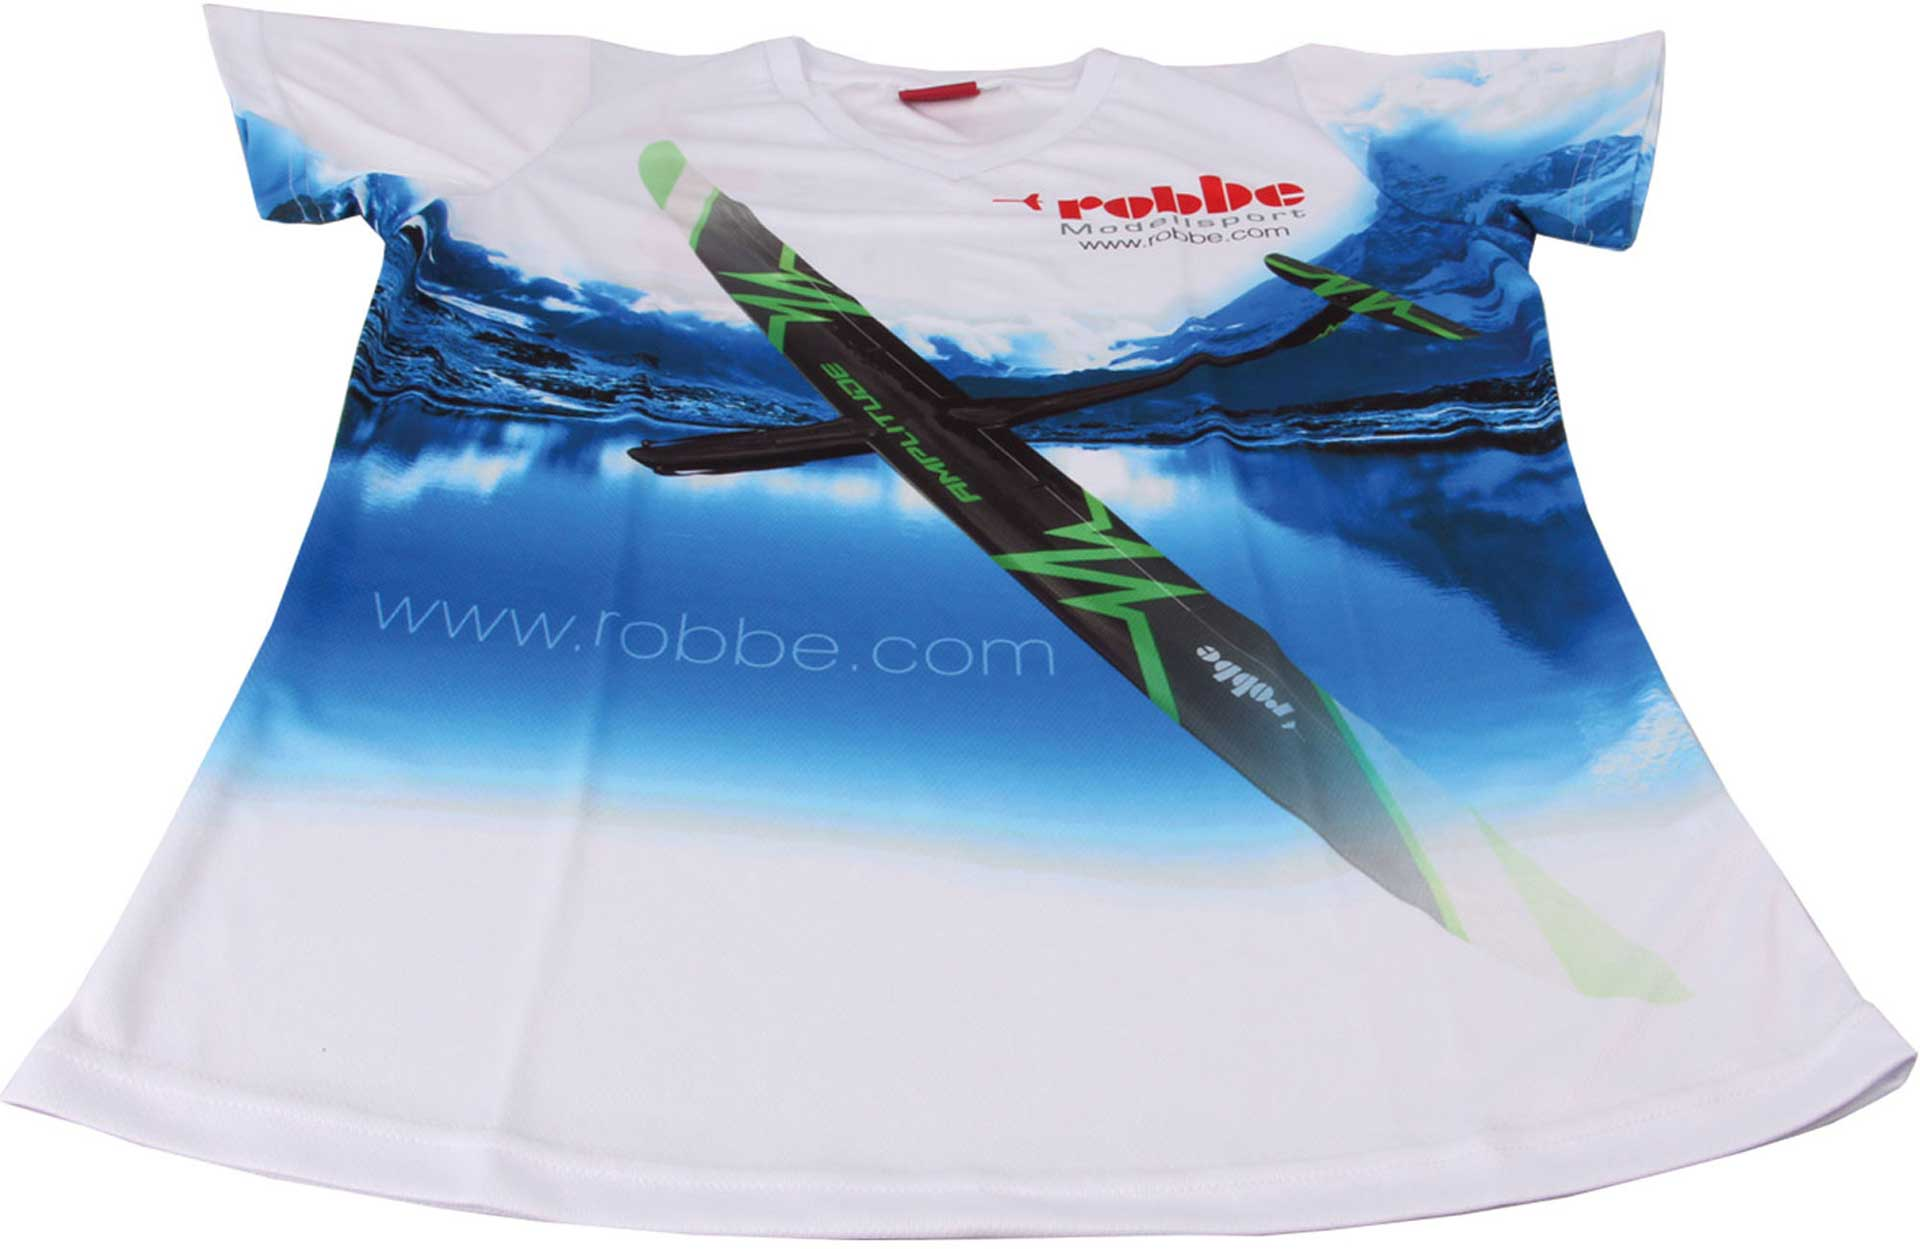 "Robbe Modellsport FUNKTIONS T-SHIRT ""AMPLITUDE"" ROBBE GRÖSSE L"